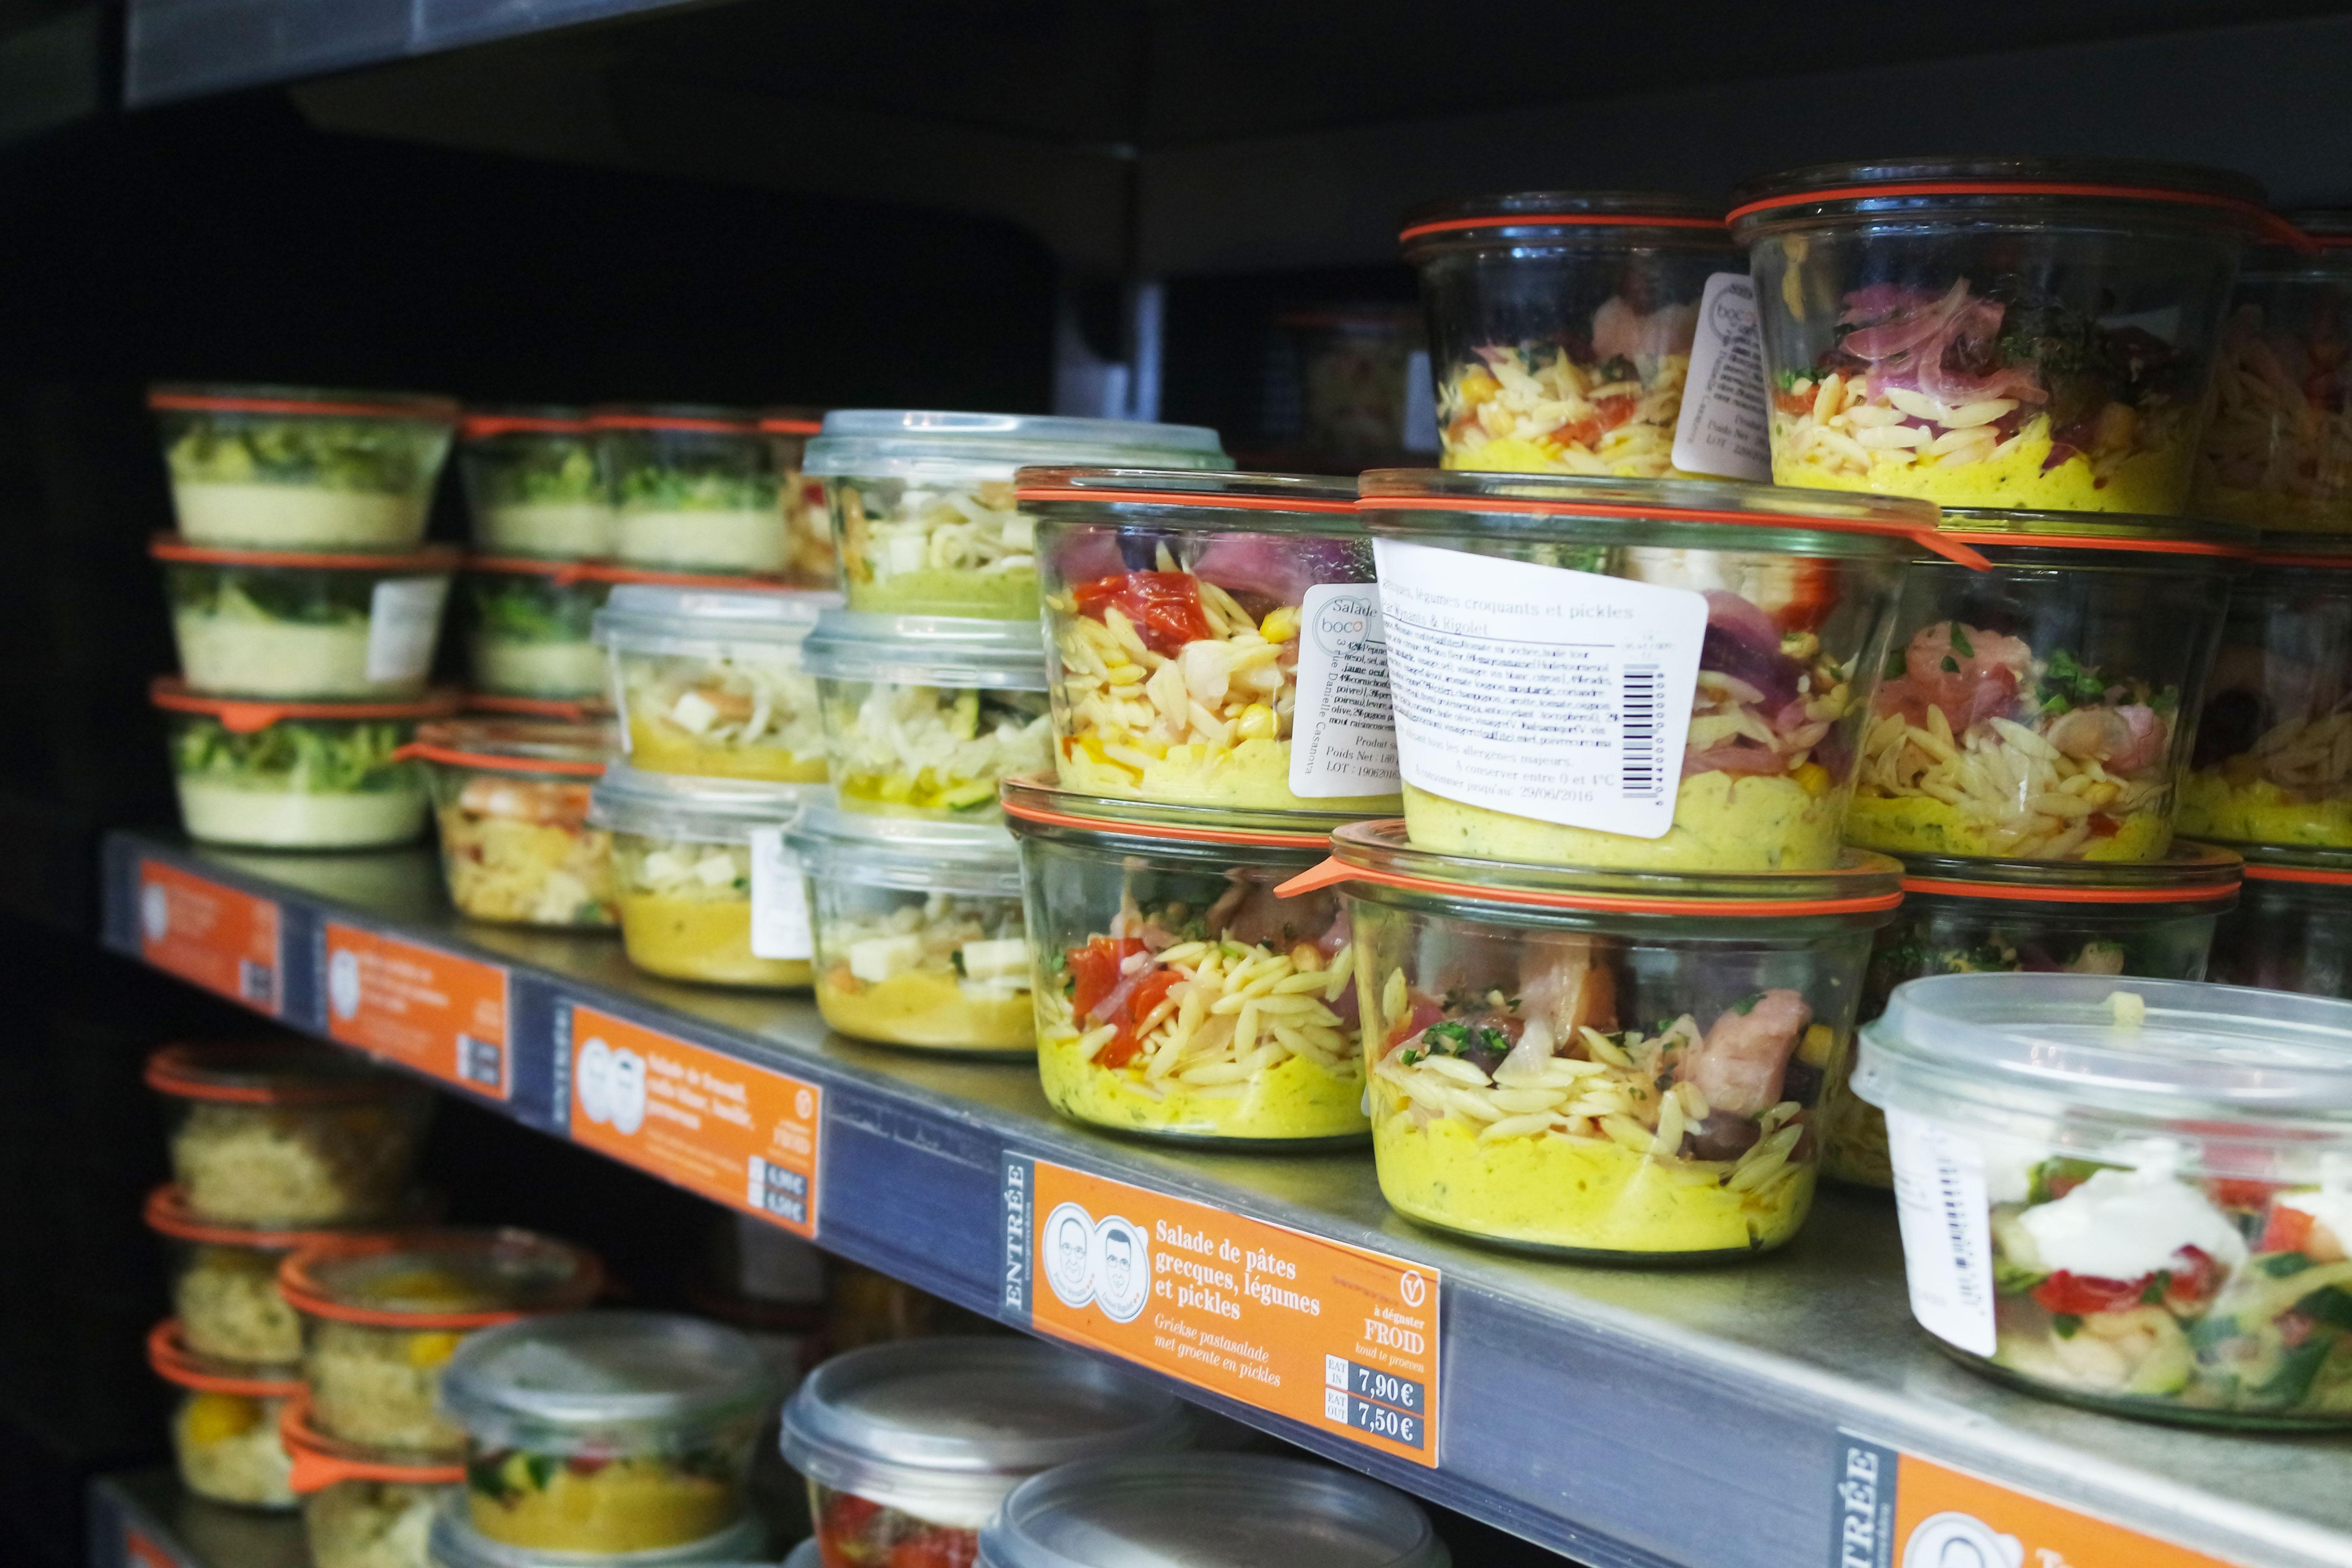 boco-bruxelles-restaurant-lunch-blog-test-avis-conseil-choix-emporter